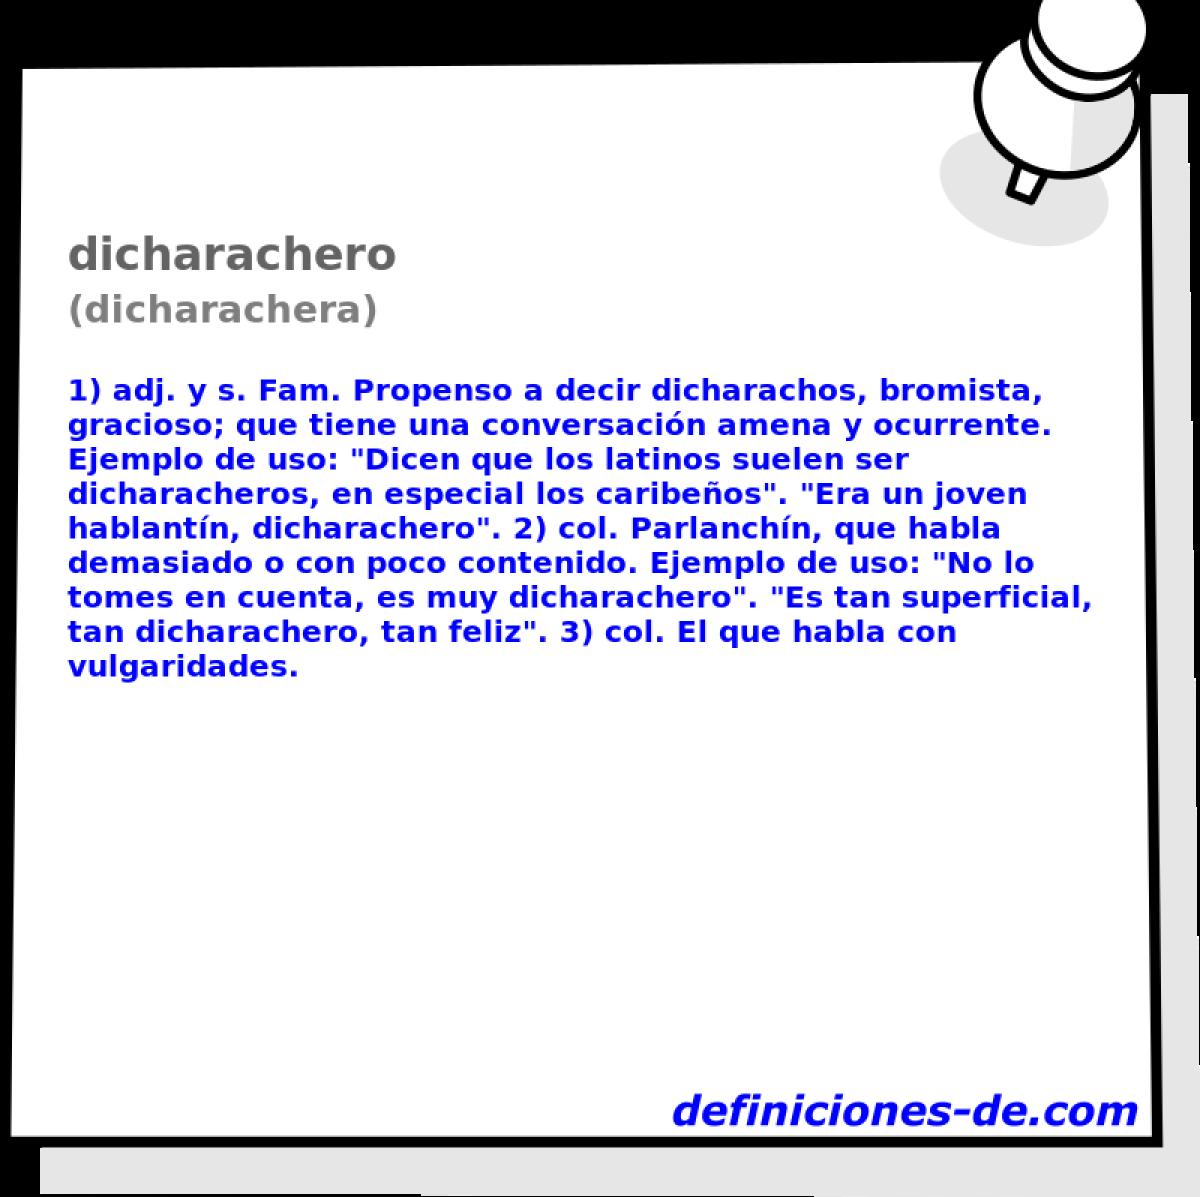 Qué significa Dicharachero (dicharachera)?